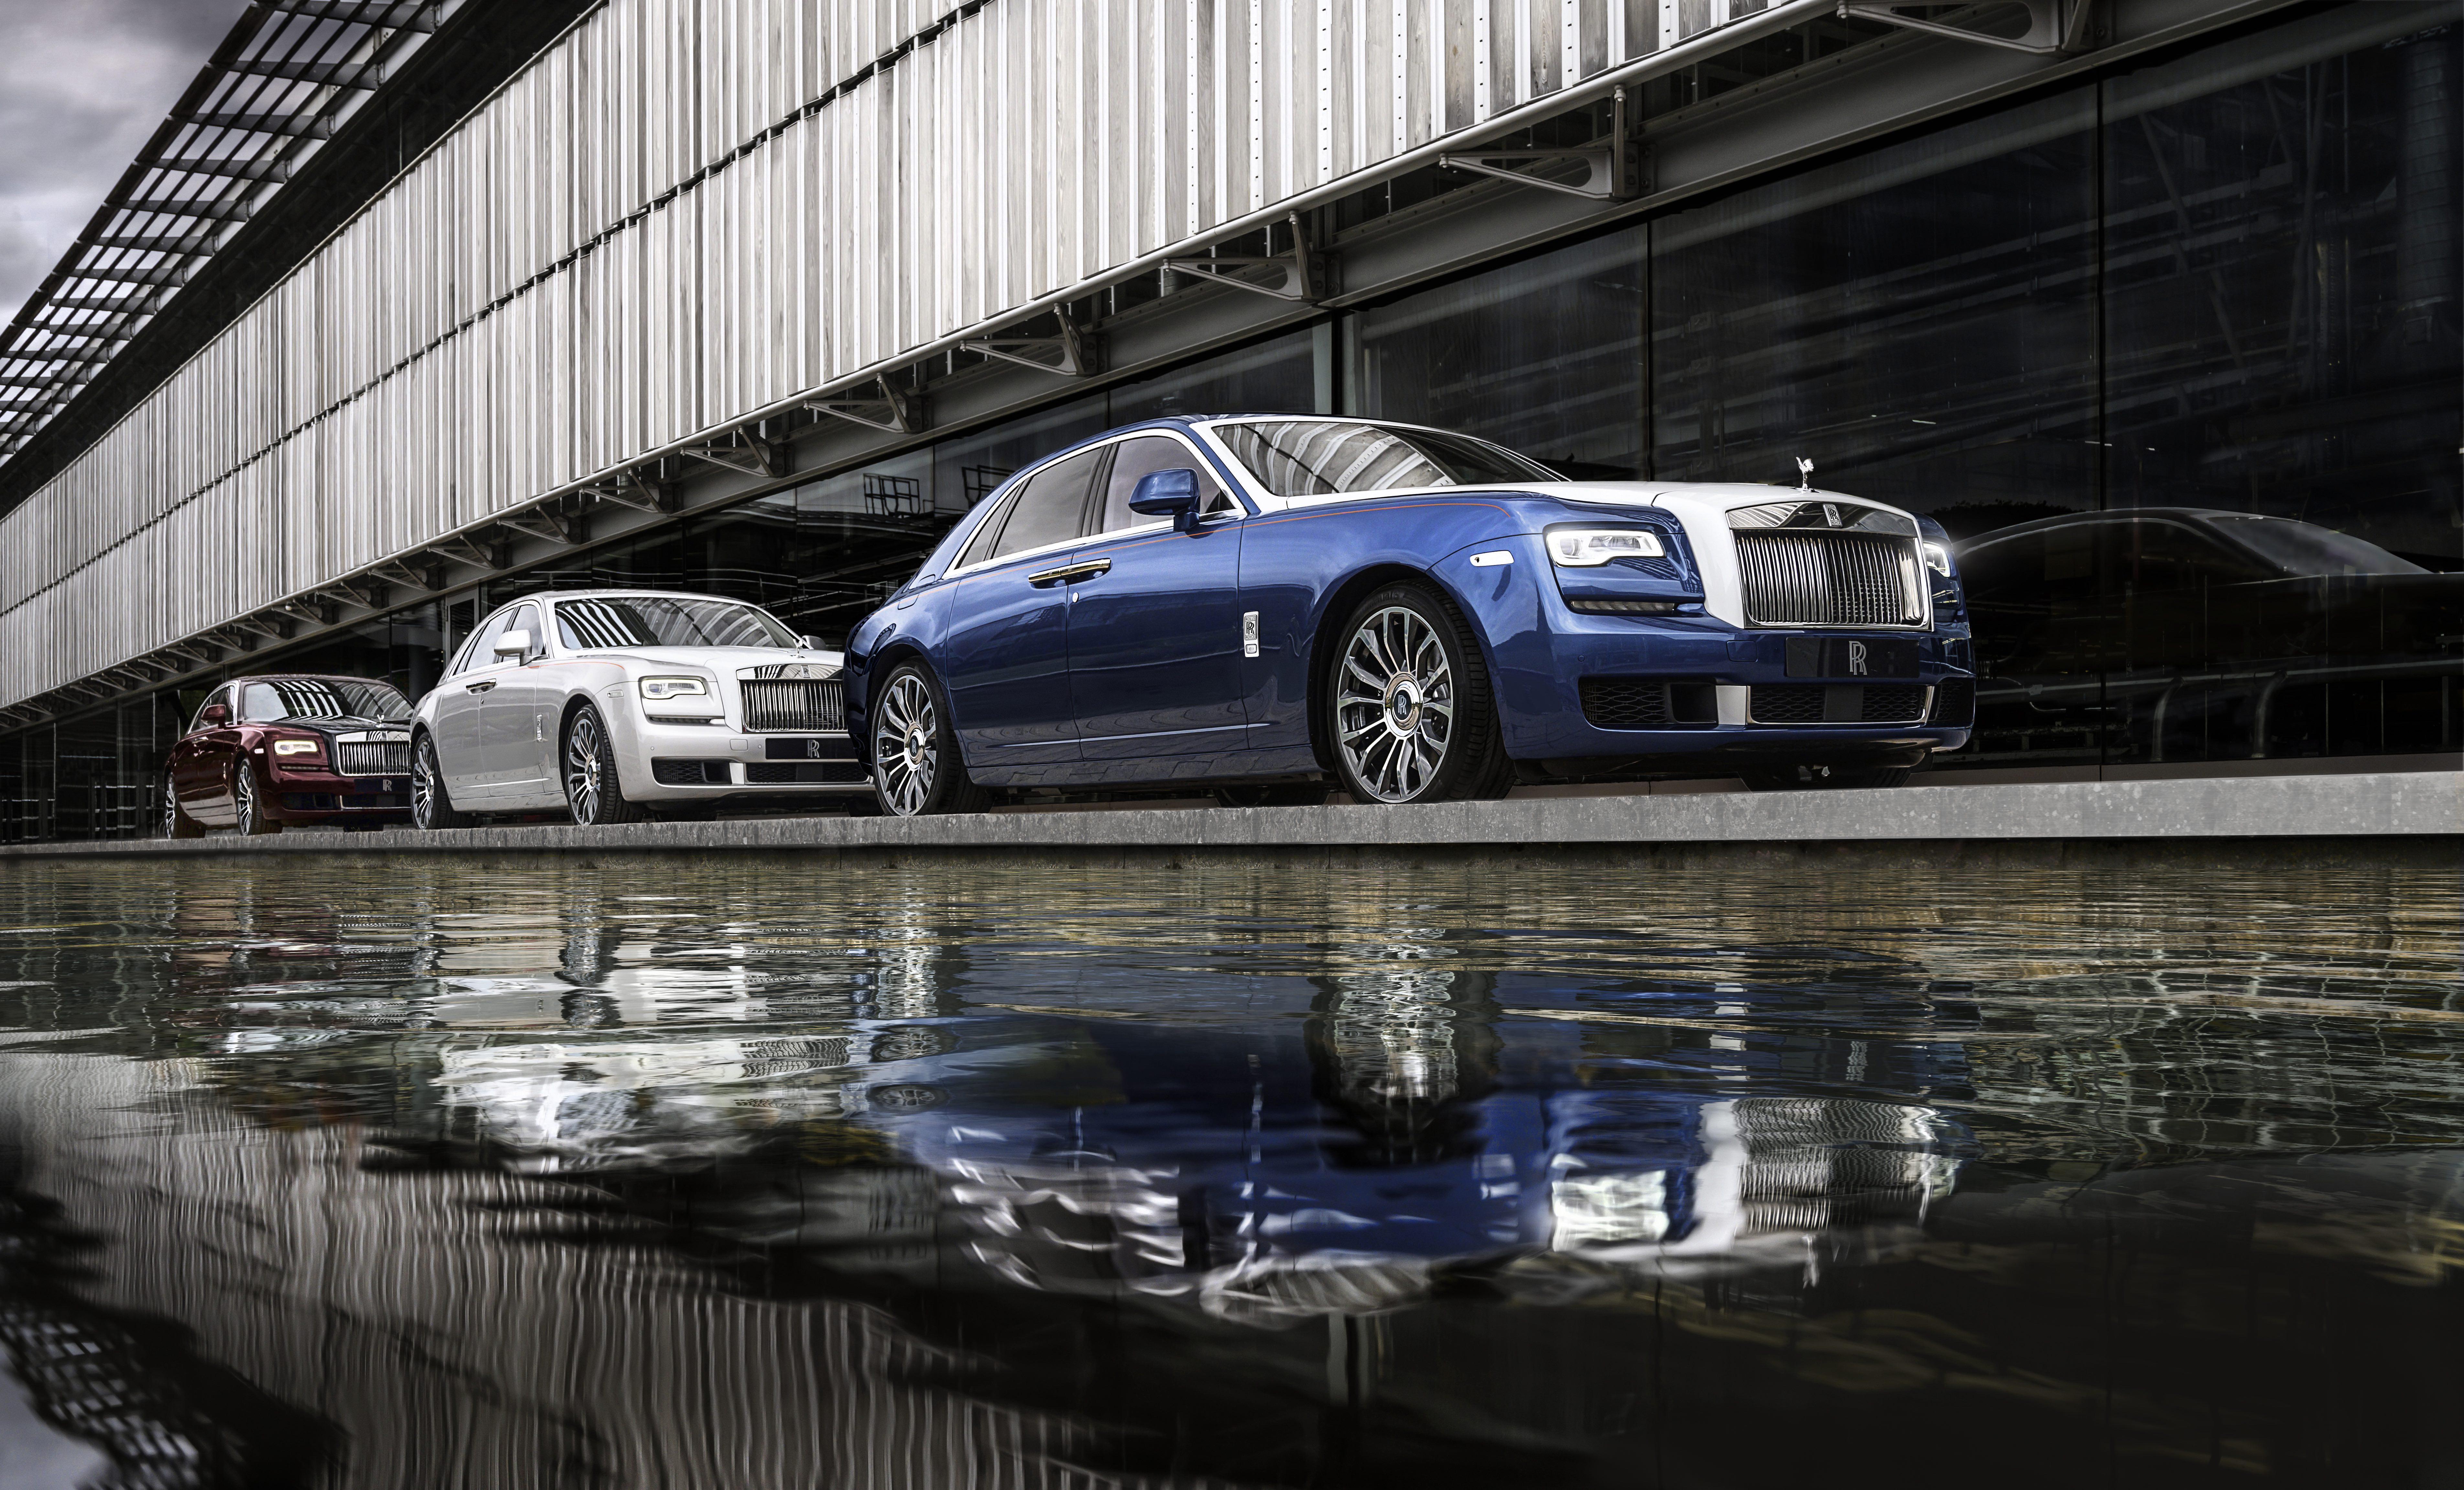 Rolls Royce Ghost Wallpaper Posted By Sarah Walker